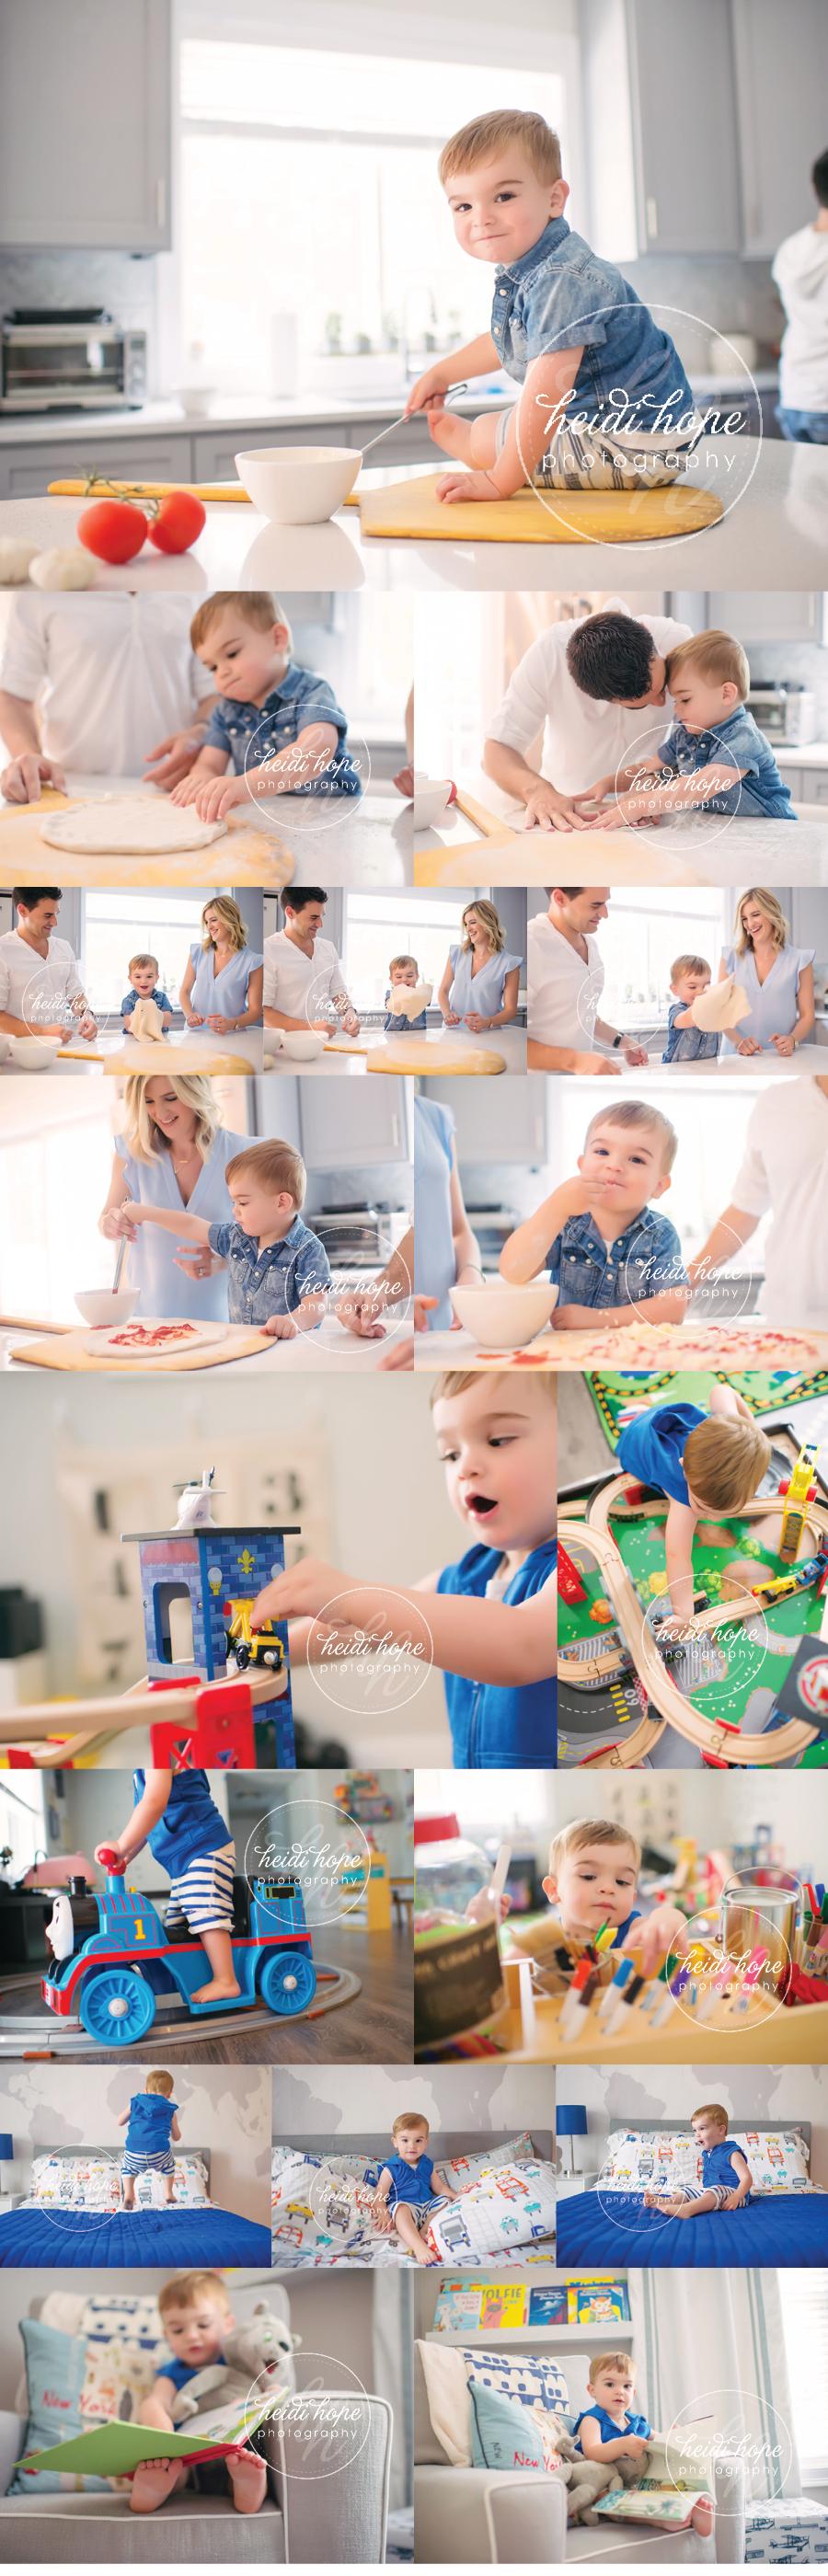 Family   Lifestyle Photography   Heidi Hope Photography